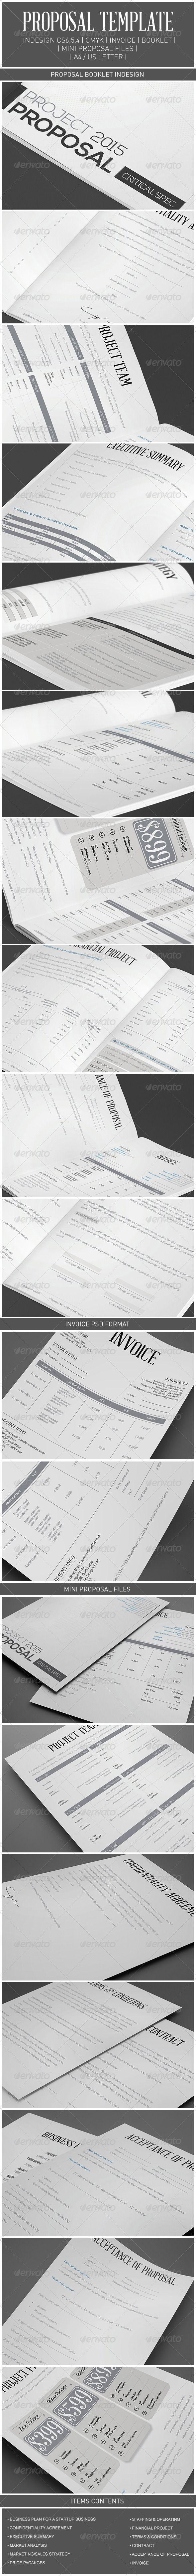 Marketing Proposal Template     Sample Marketing Proposal Template Resume Template   Essay Sample Free Essay Sample Free